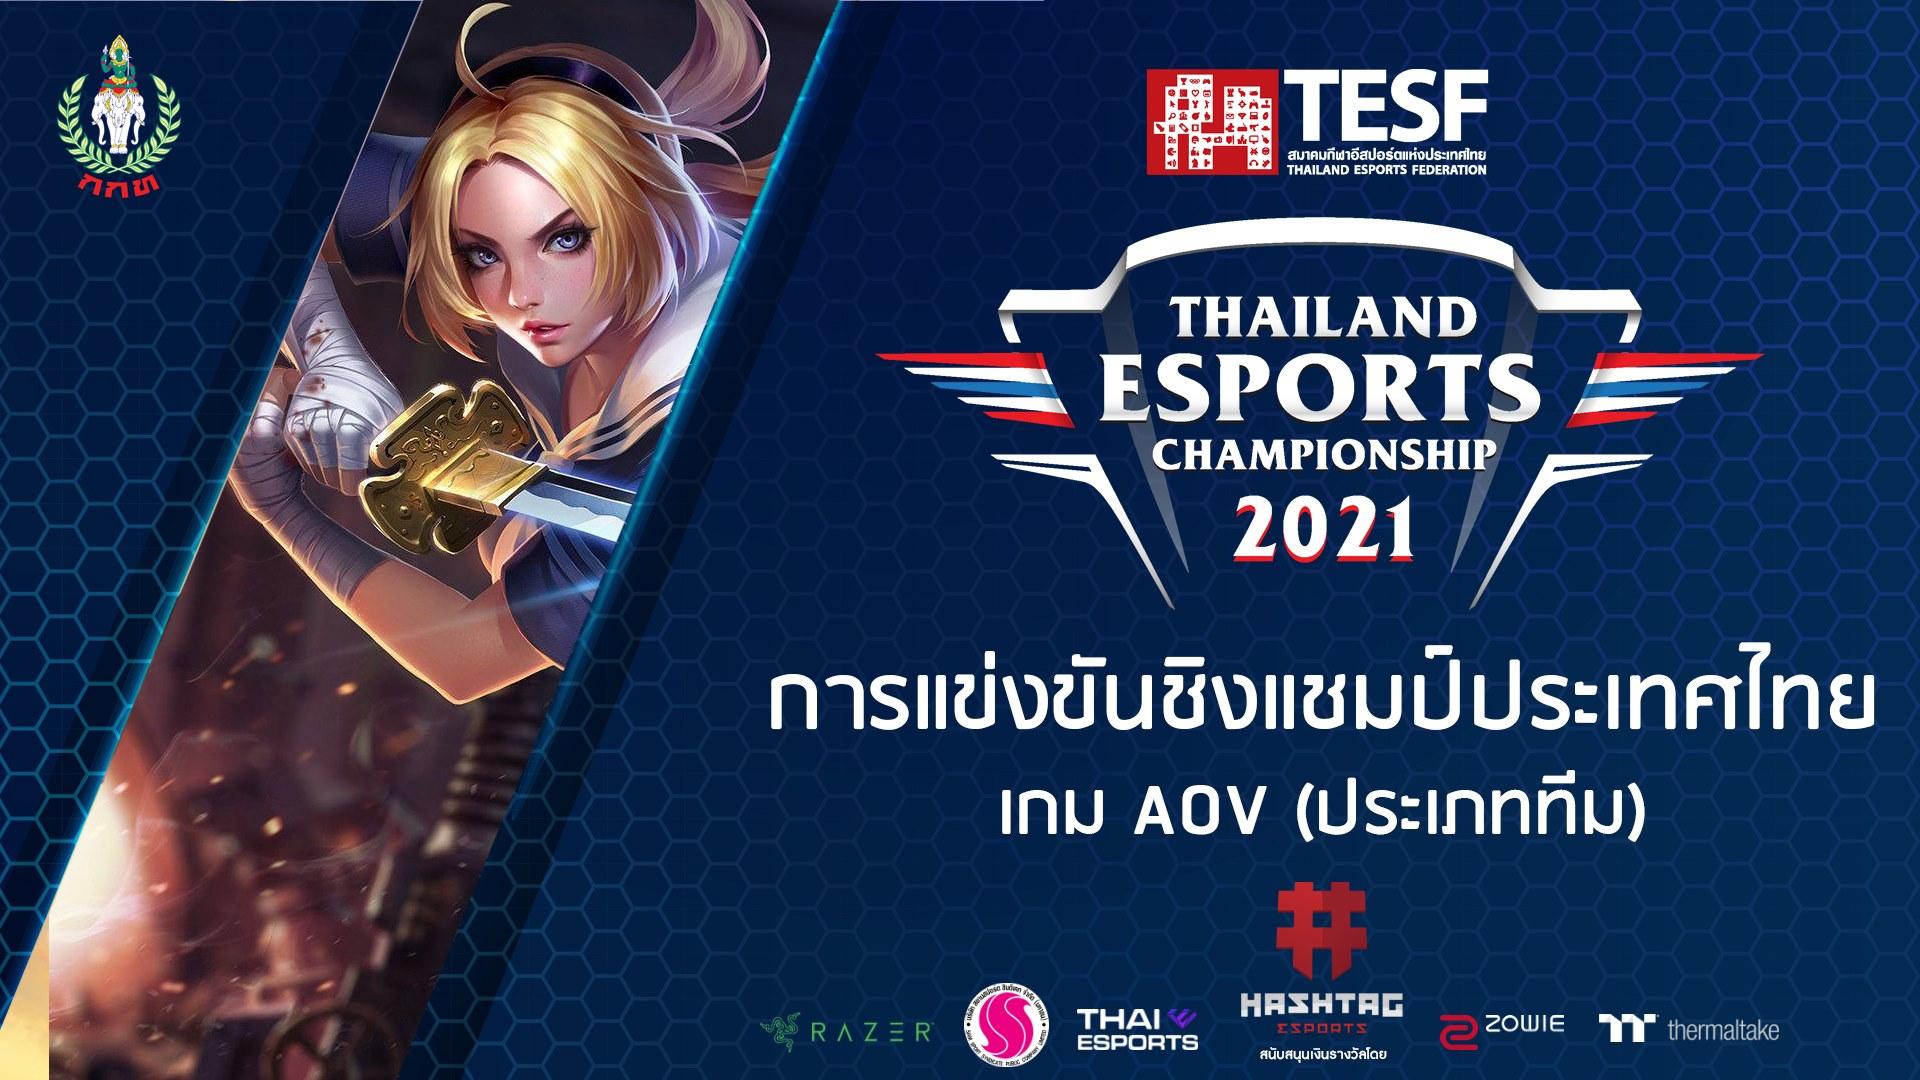 Thailand Esports 1082021 2